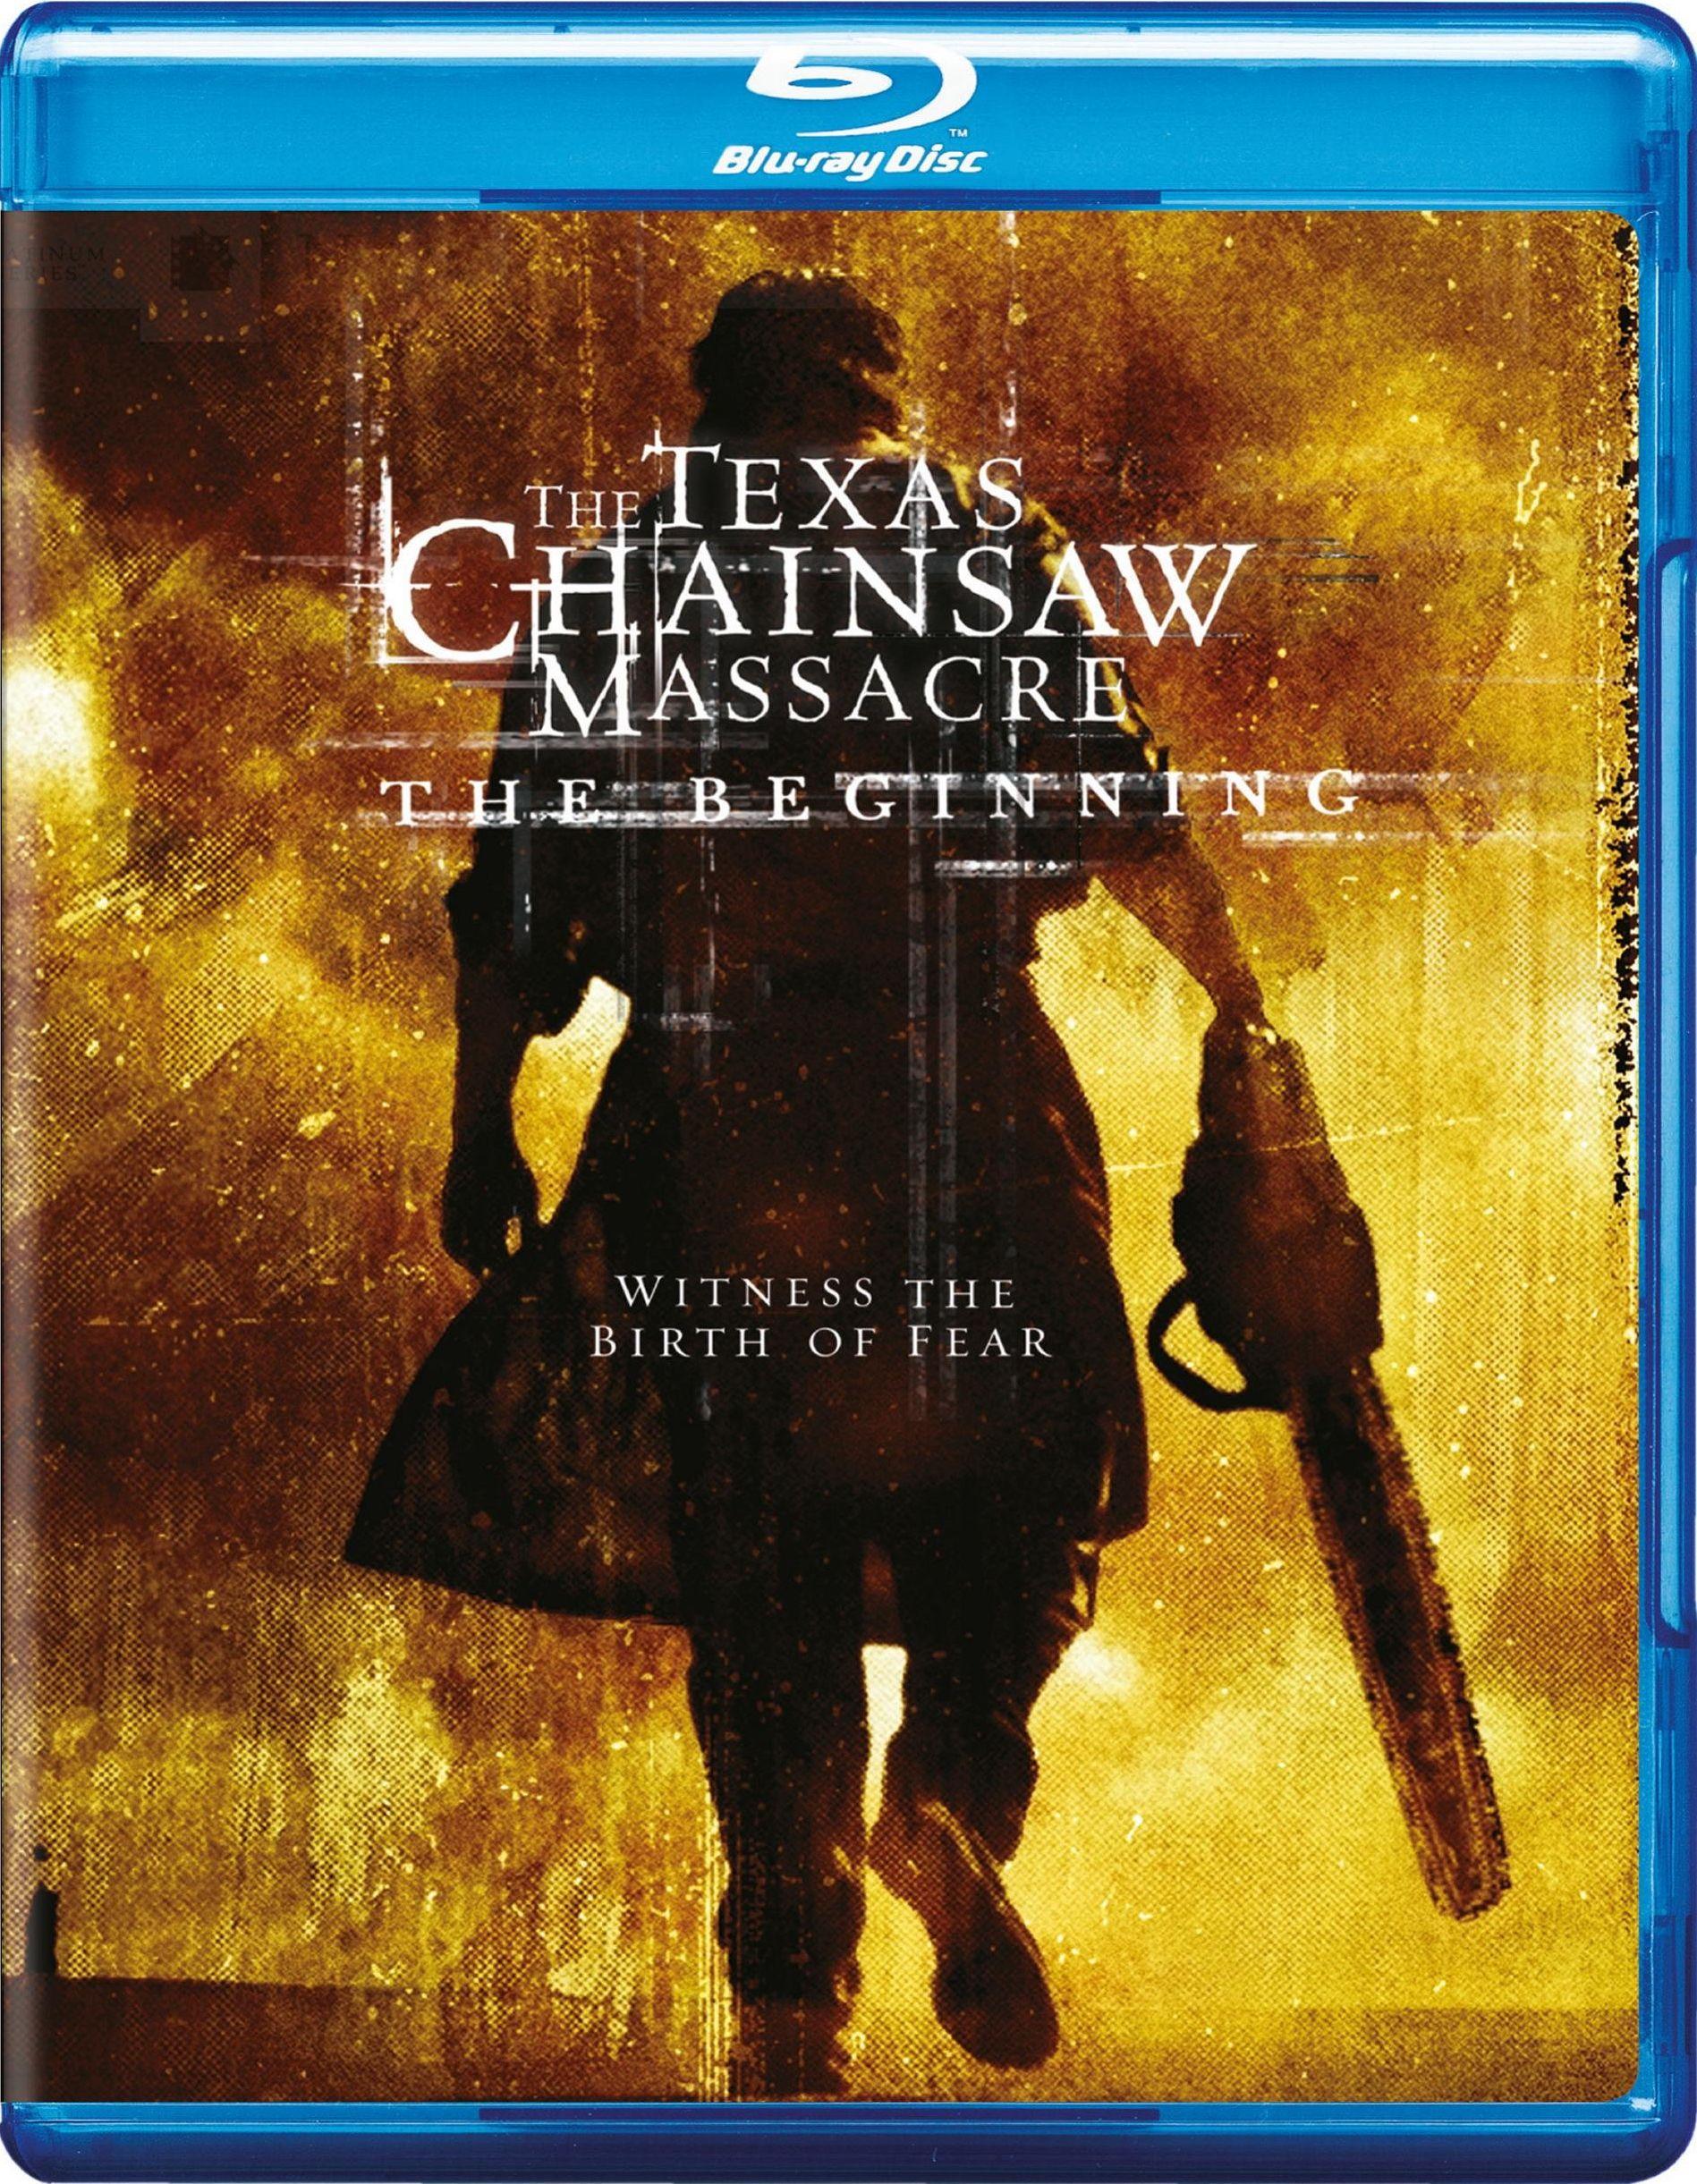 The Texas Chainsaw Massacre (1974) - The Texas Chainsaw